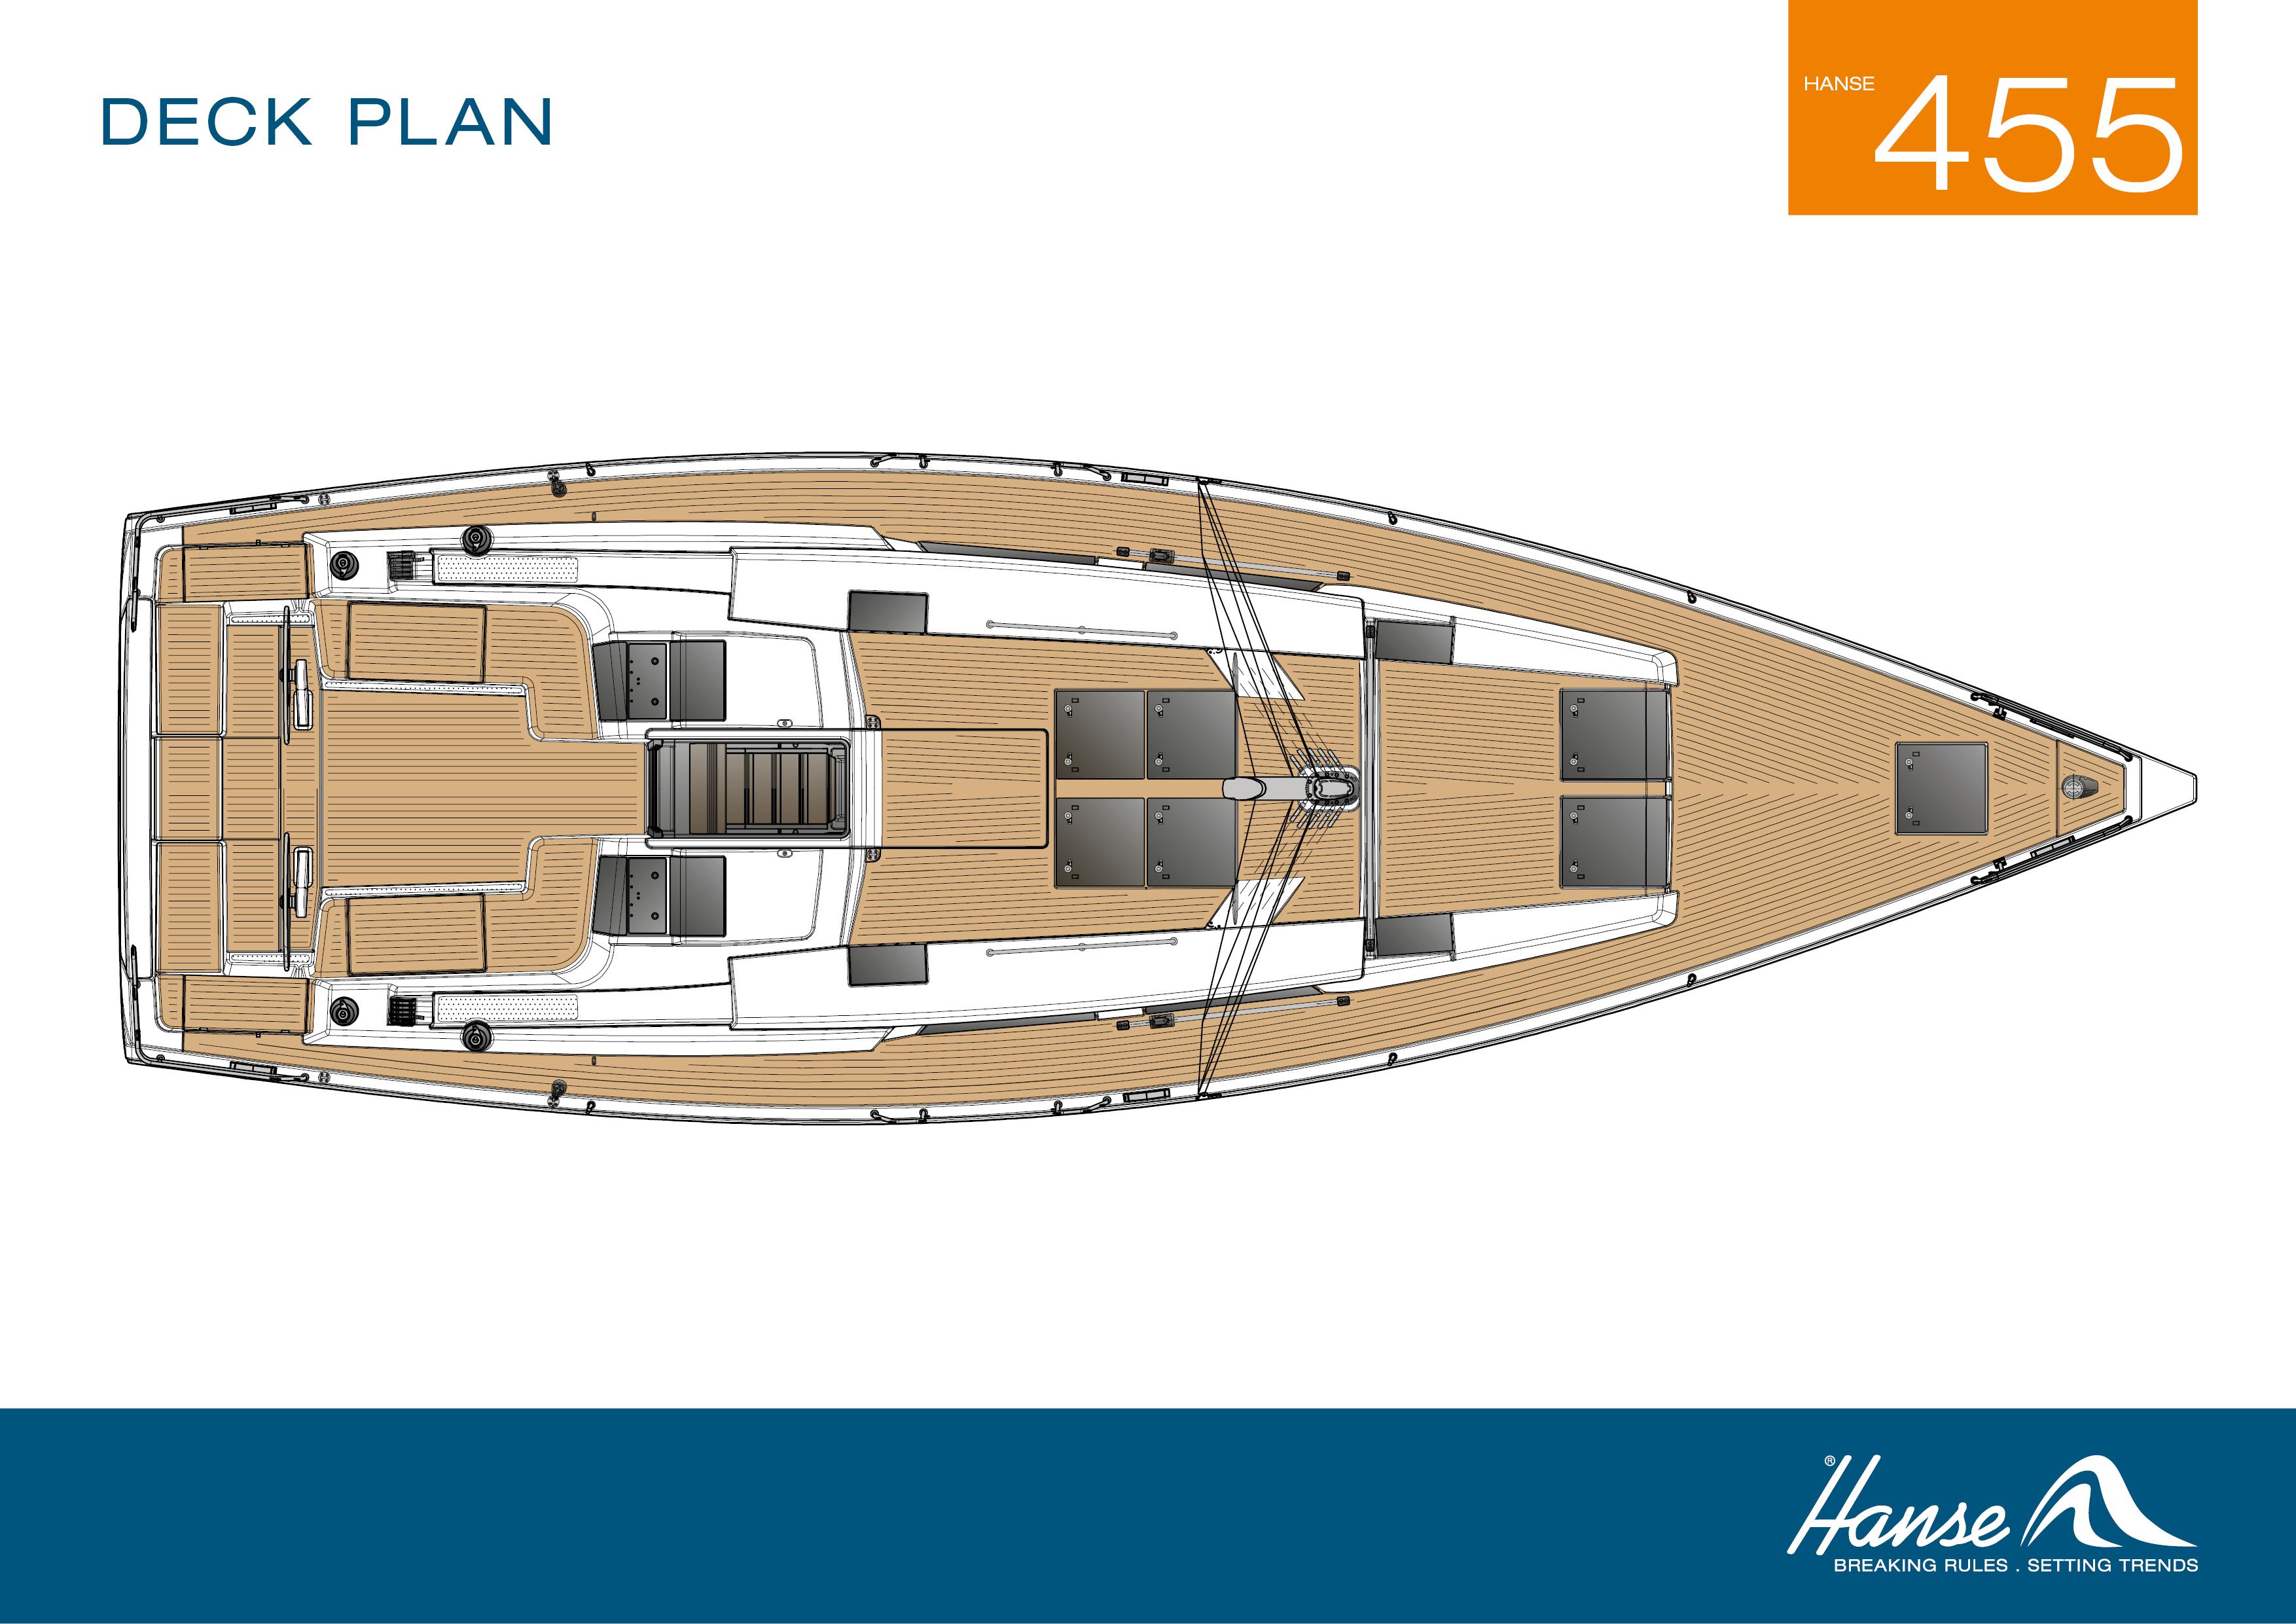 Hanse  - deck-hanse-455-269578.jpg